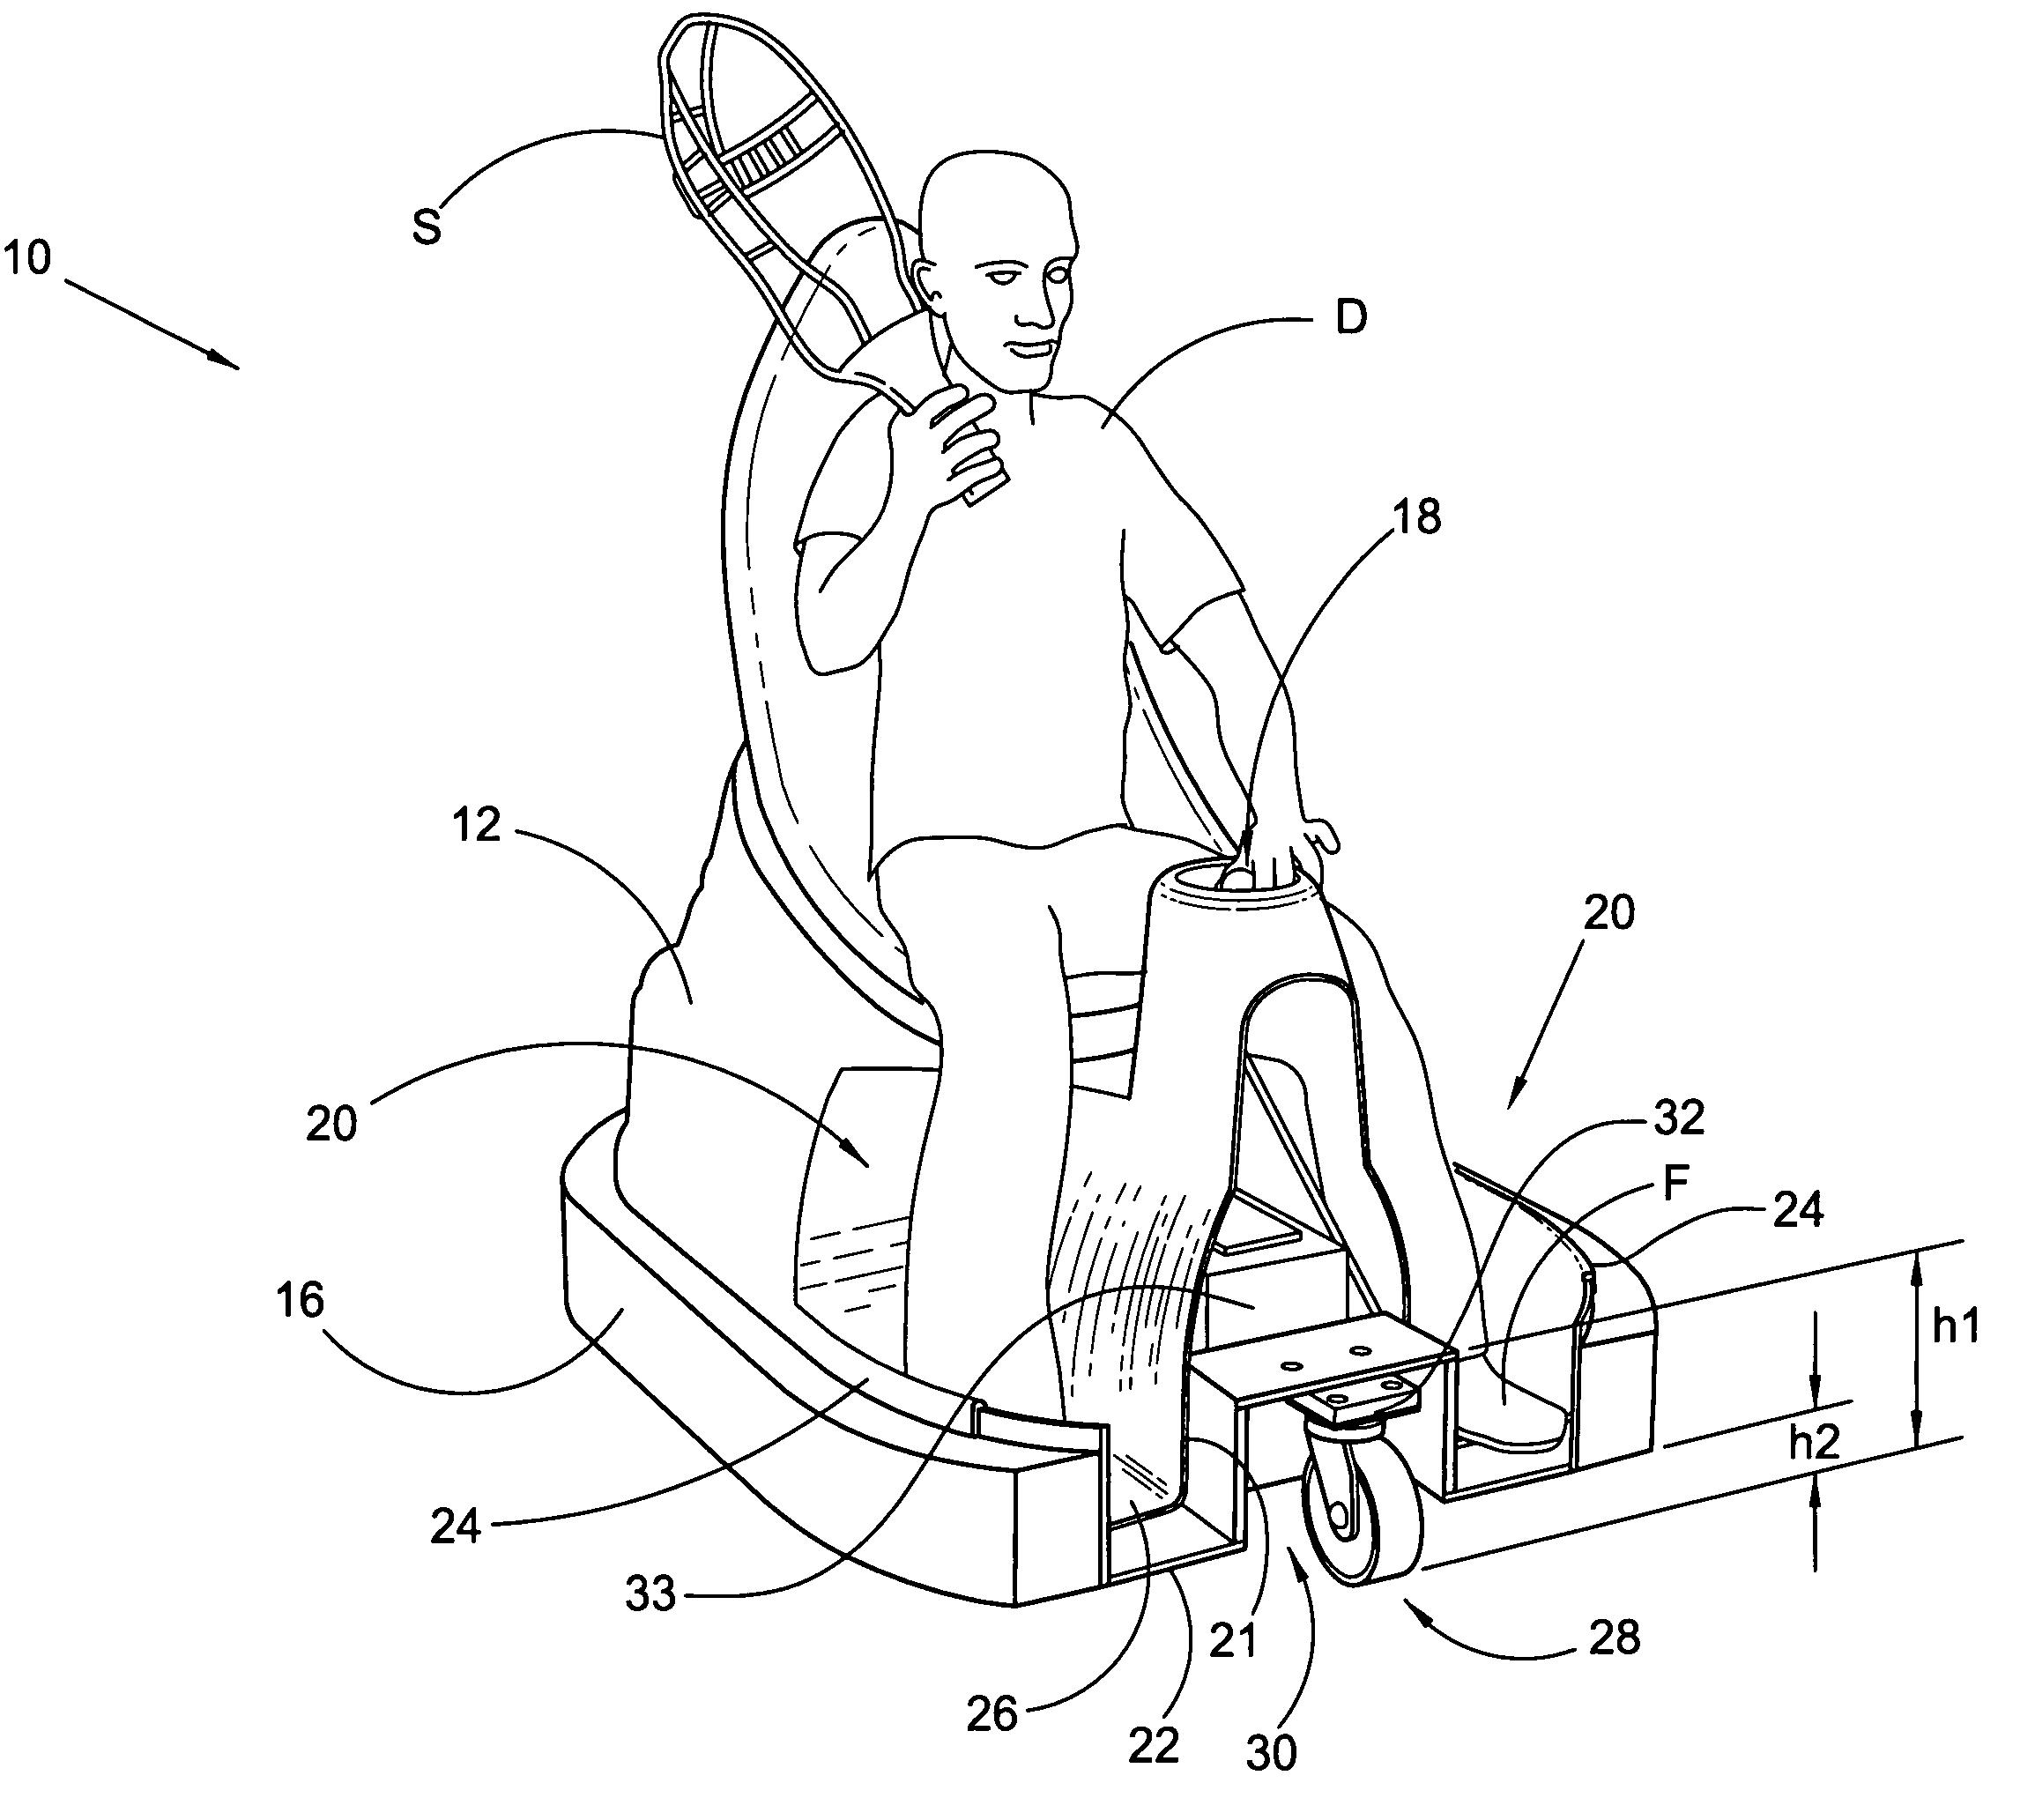 Bumper Car patent illustration from  patents.google.com